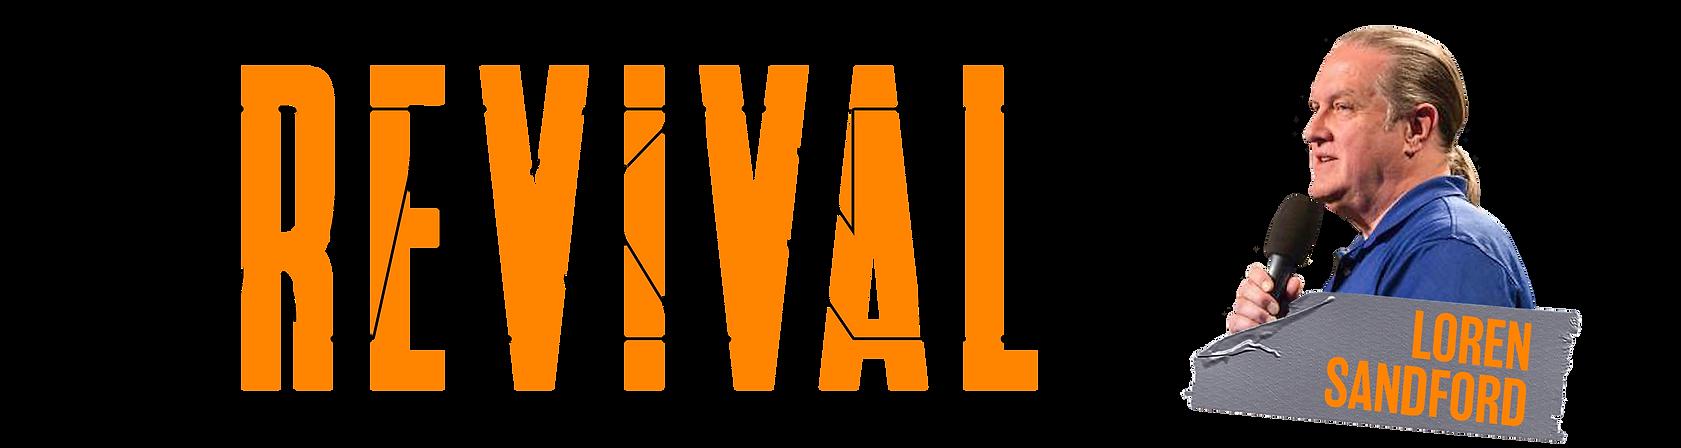 RevivalWKND_logo.png